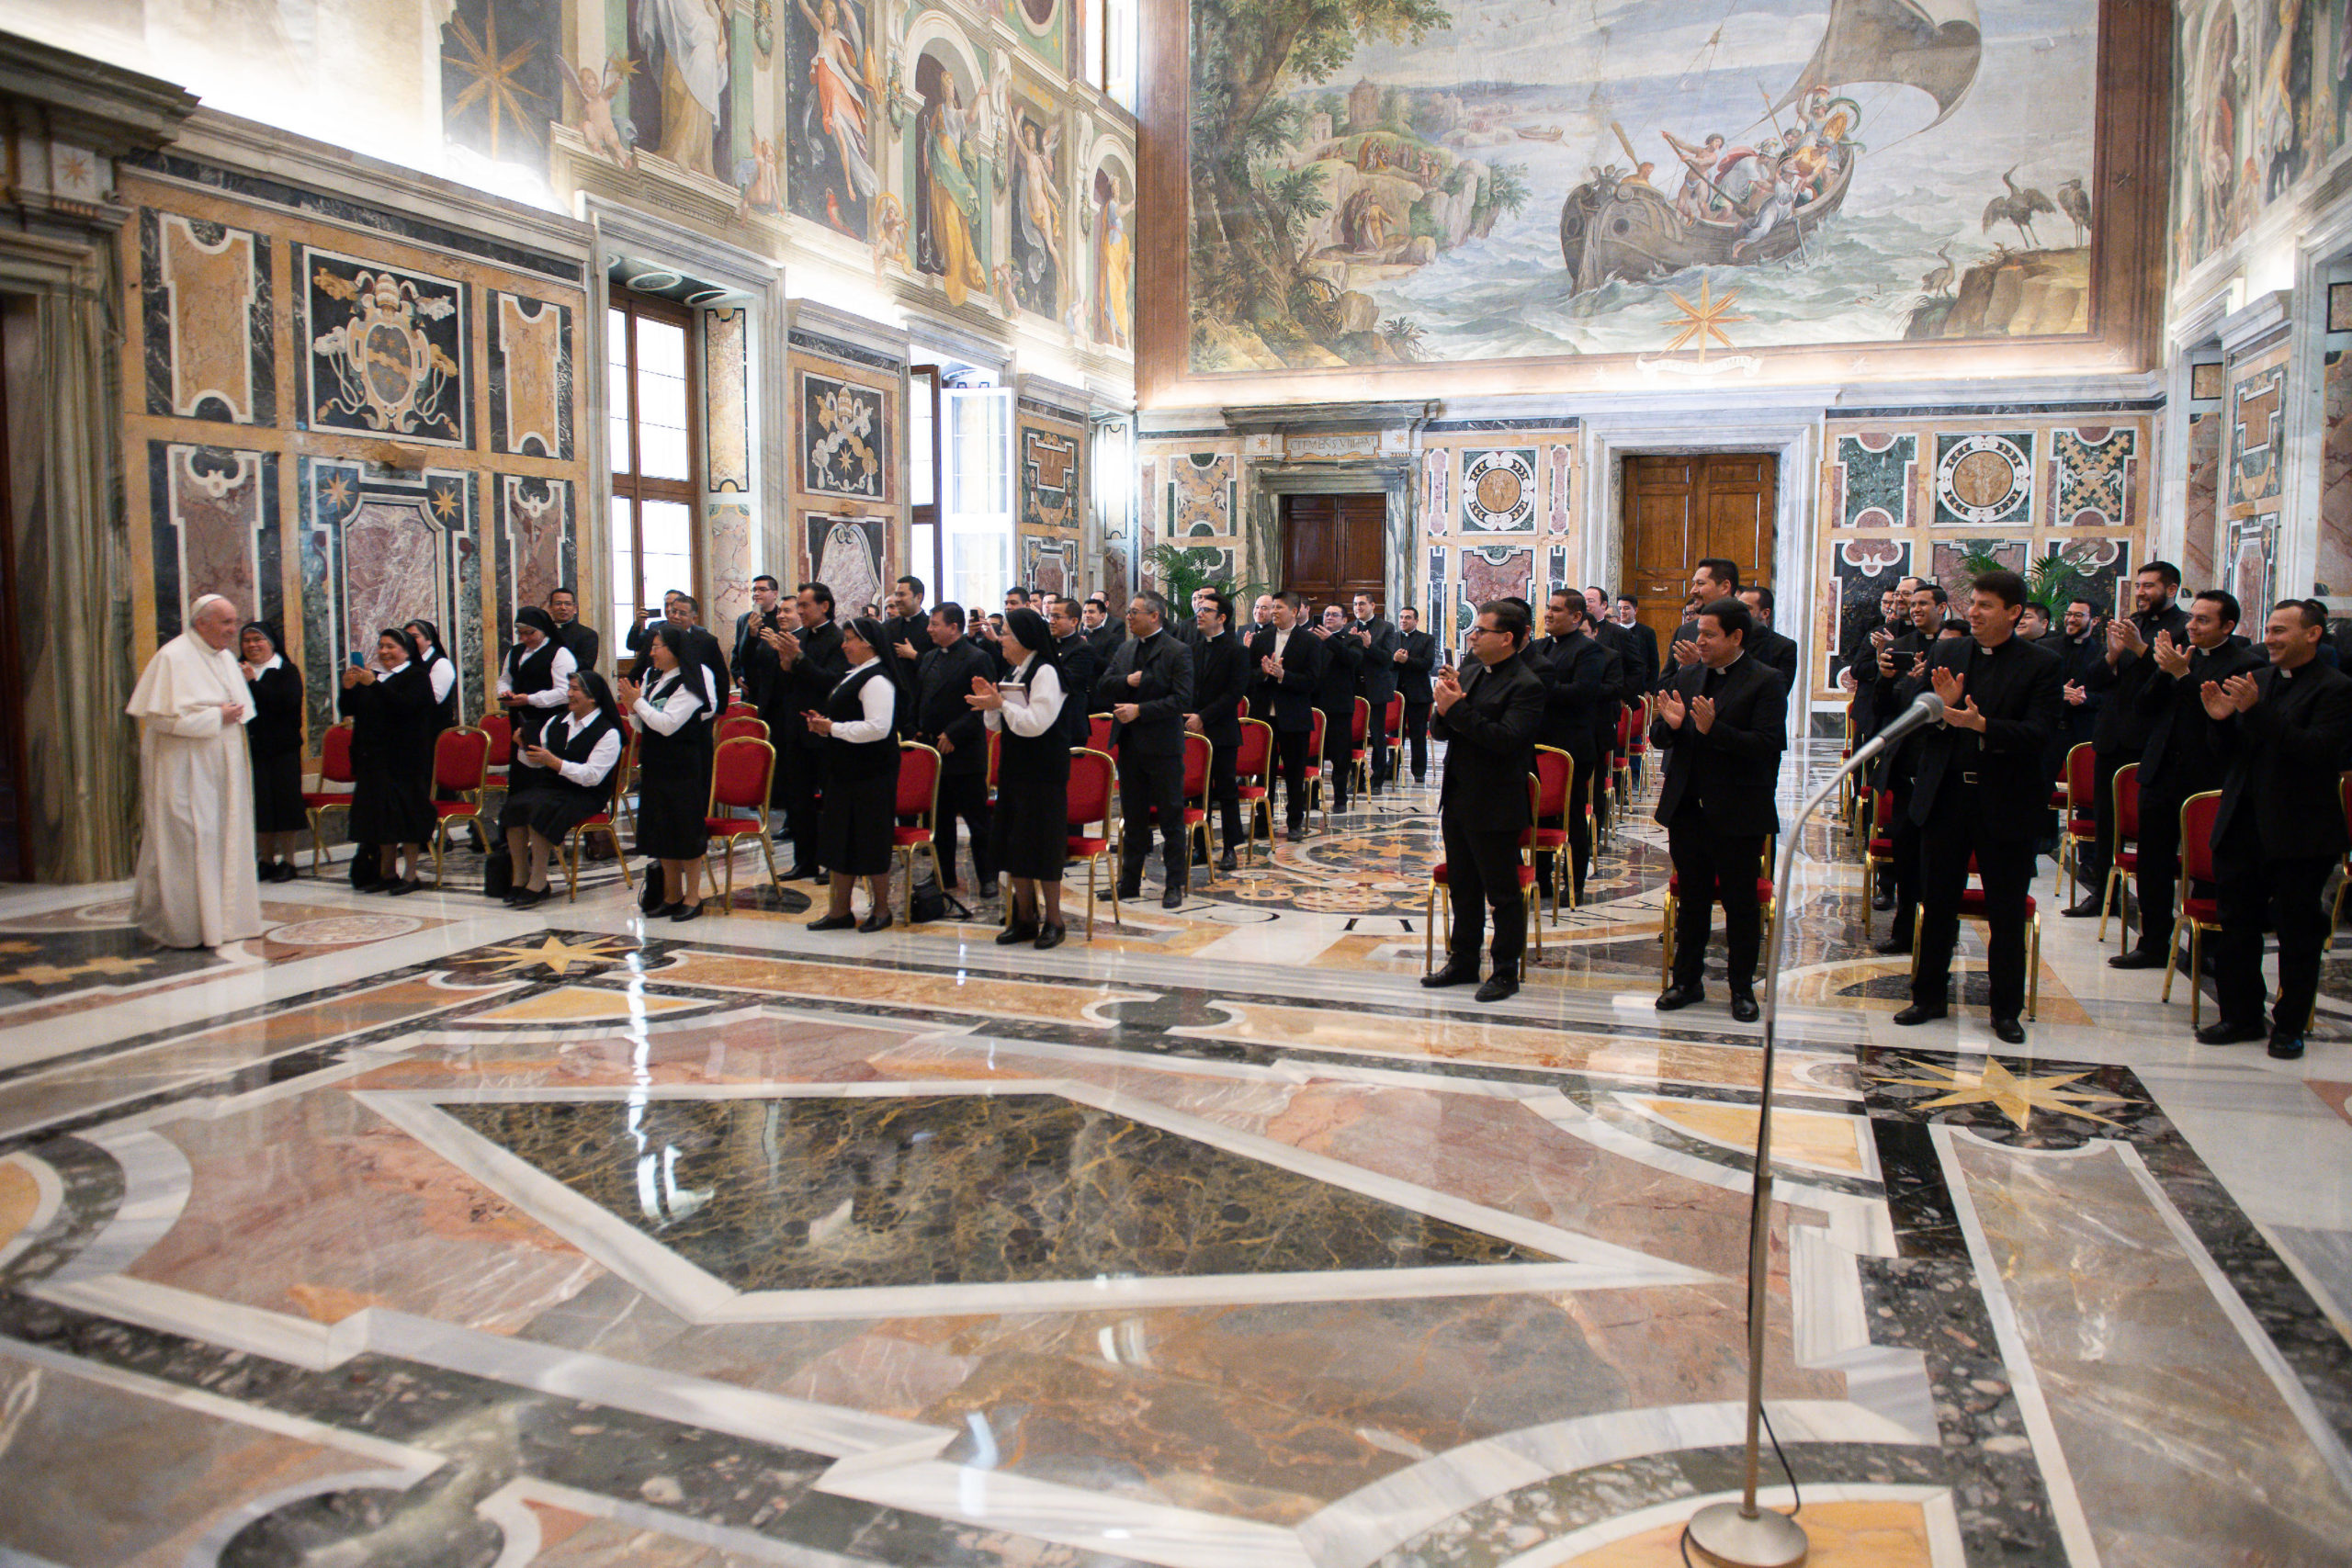 Collège pontifical mexicain, 29 mars 2021 © Vatican Media